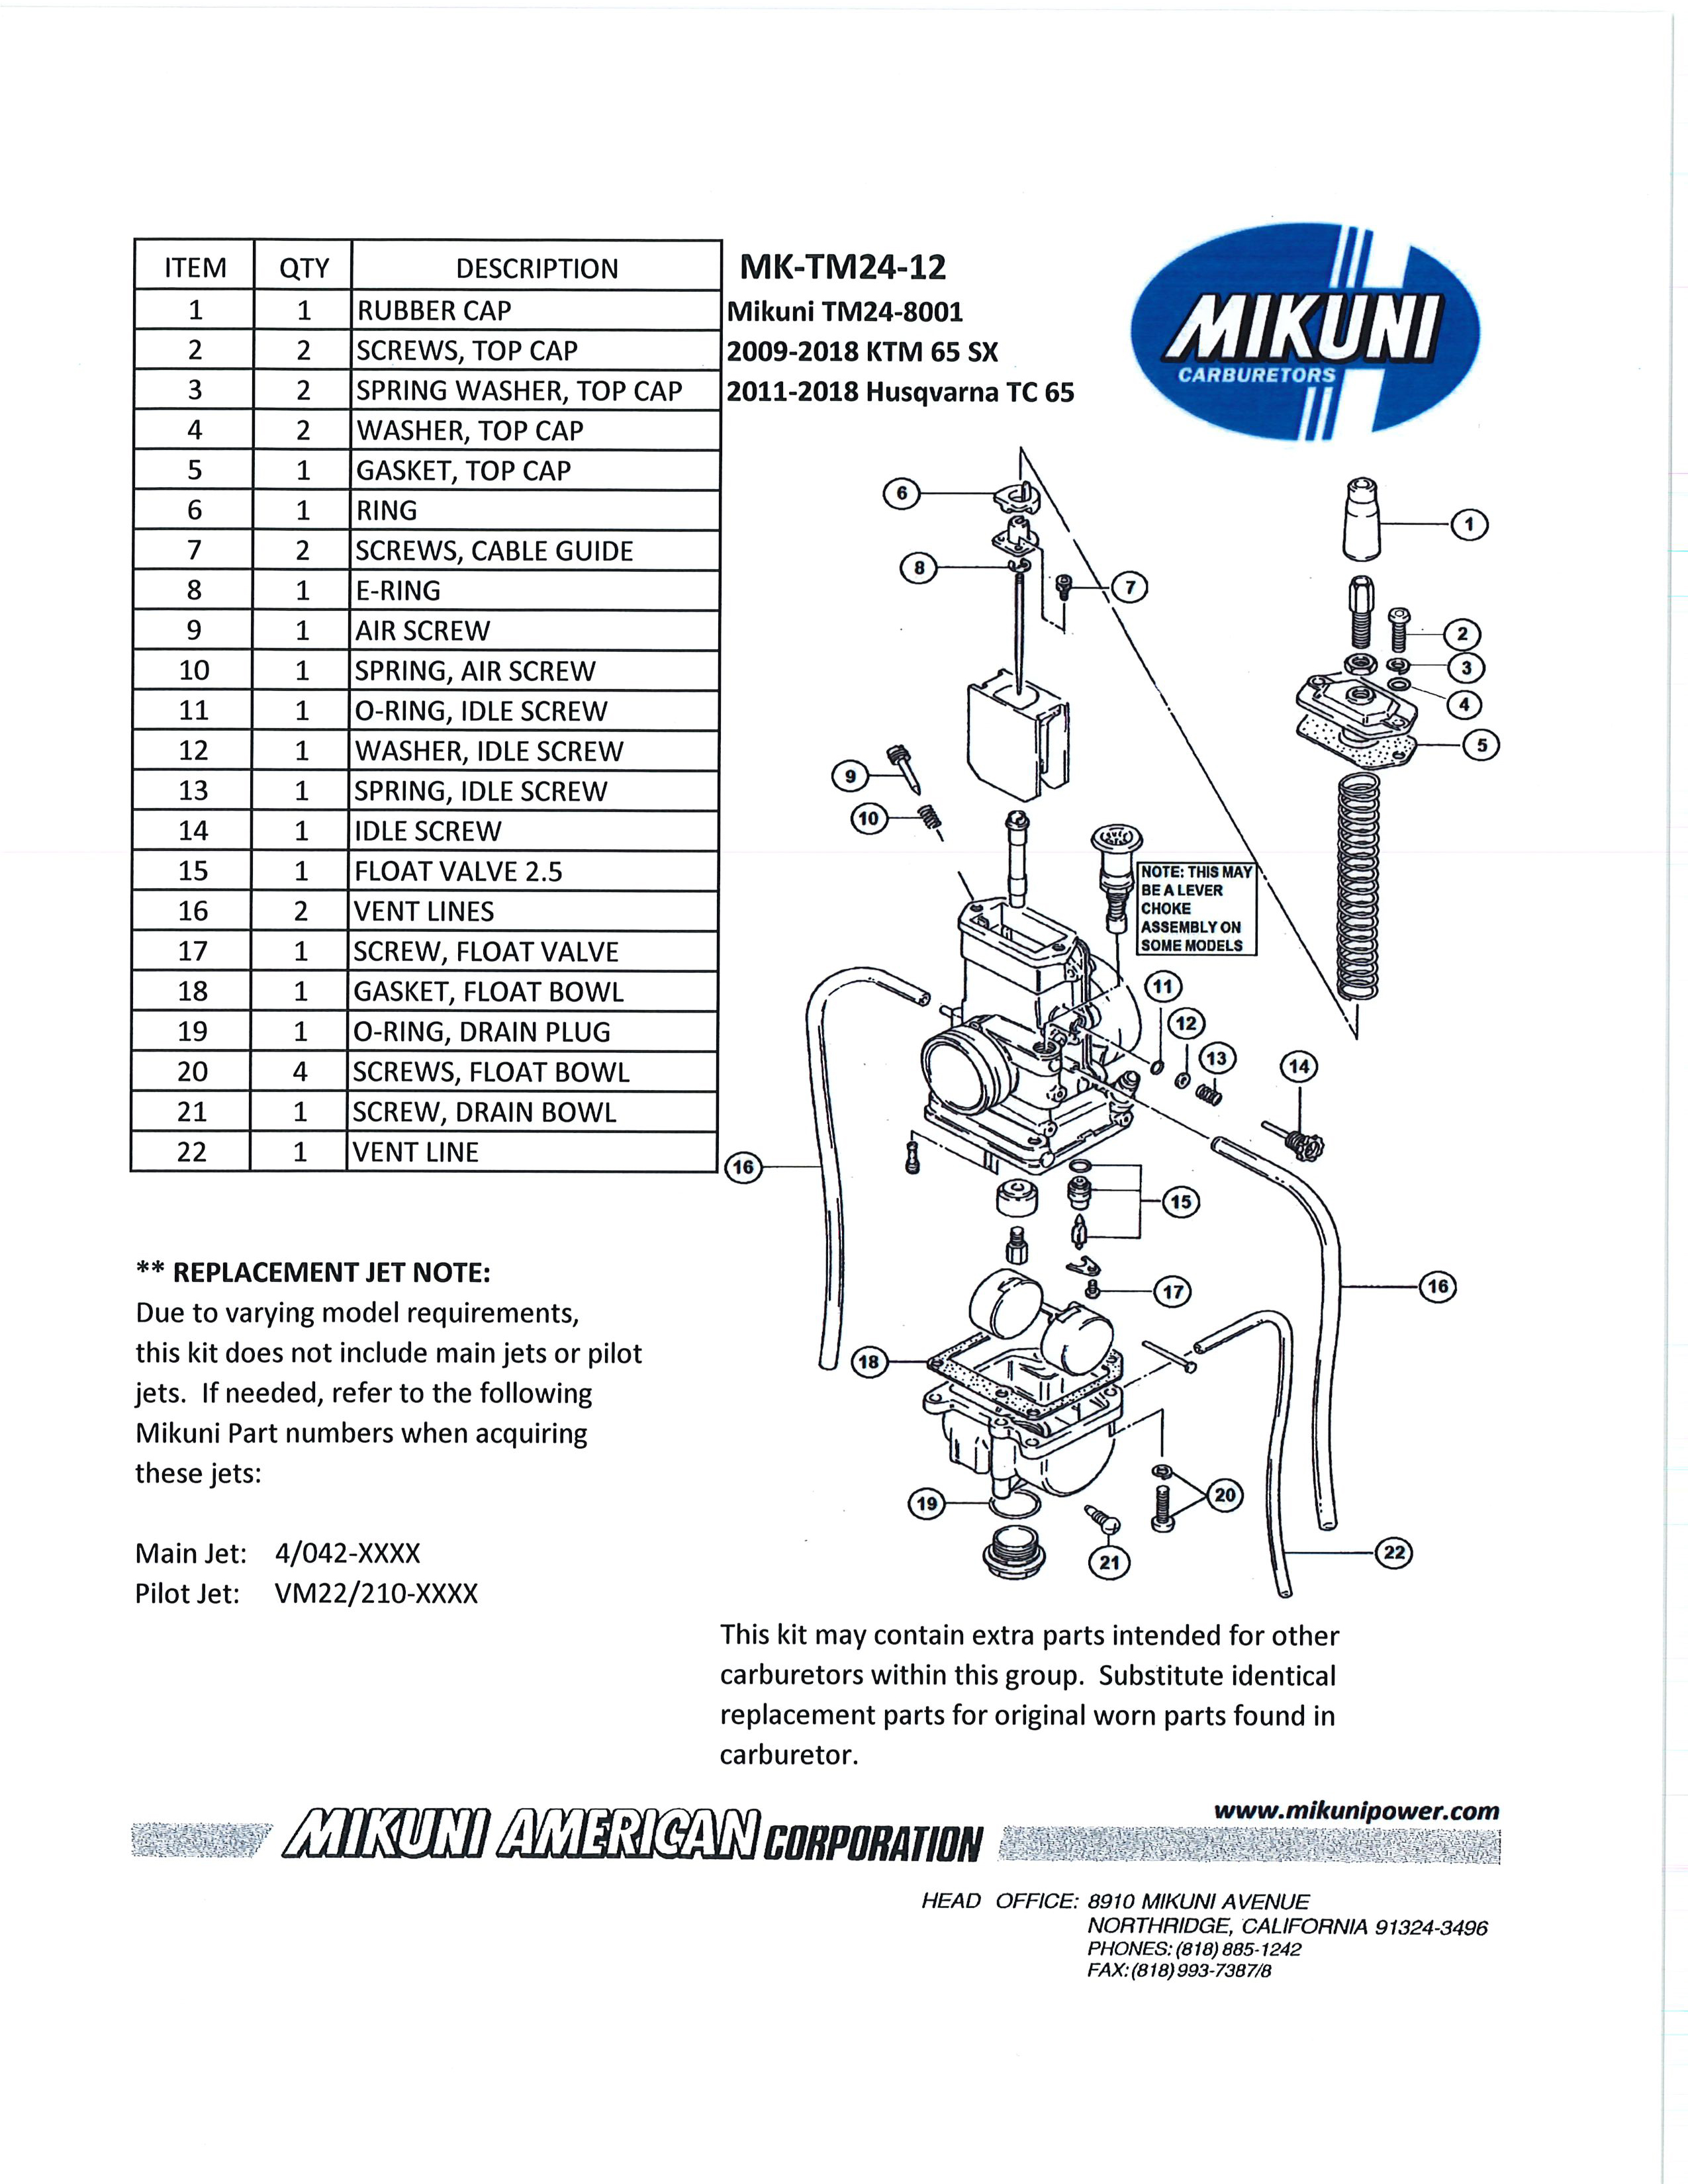 Mikuni Power - Mikuni Genuine Carburetor & Fuel Pump Rebuild Kits